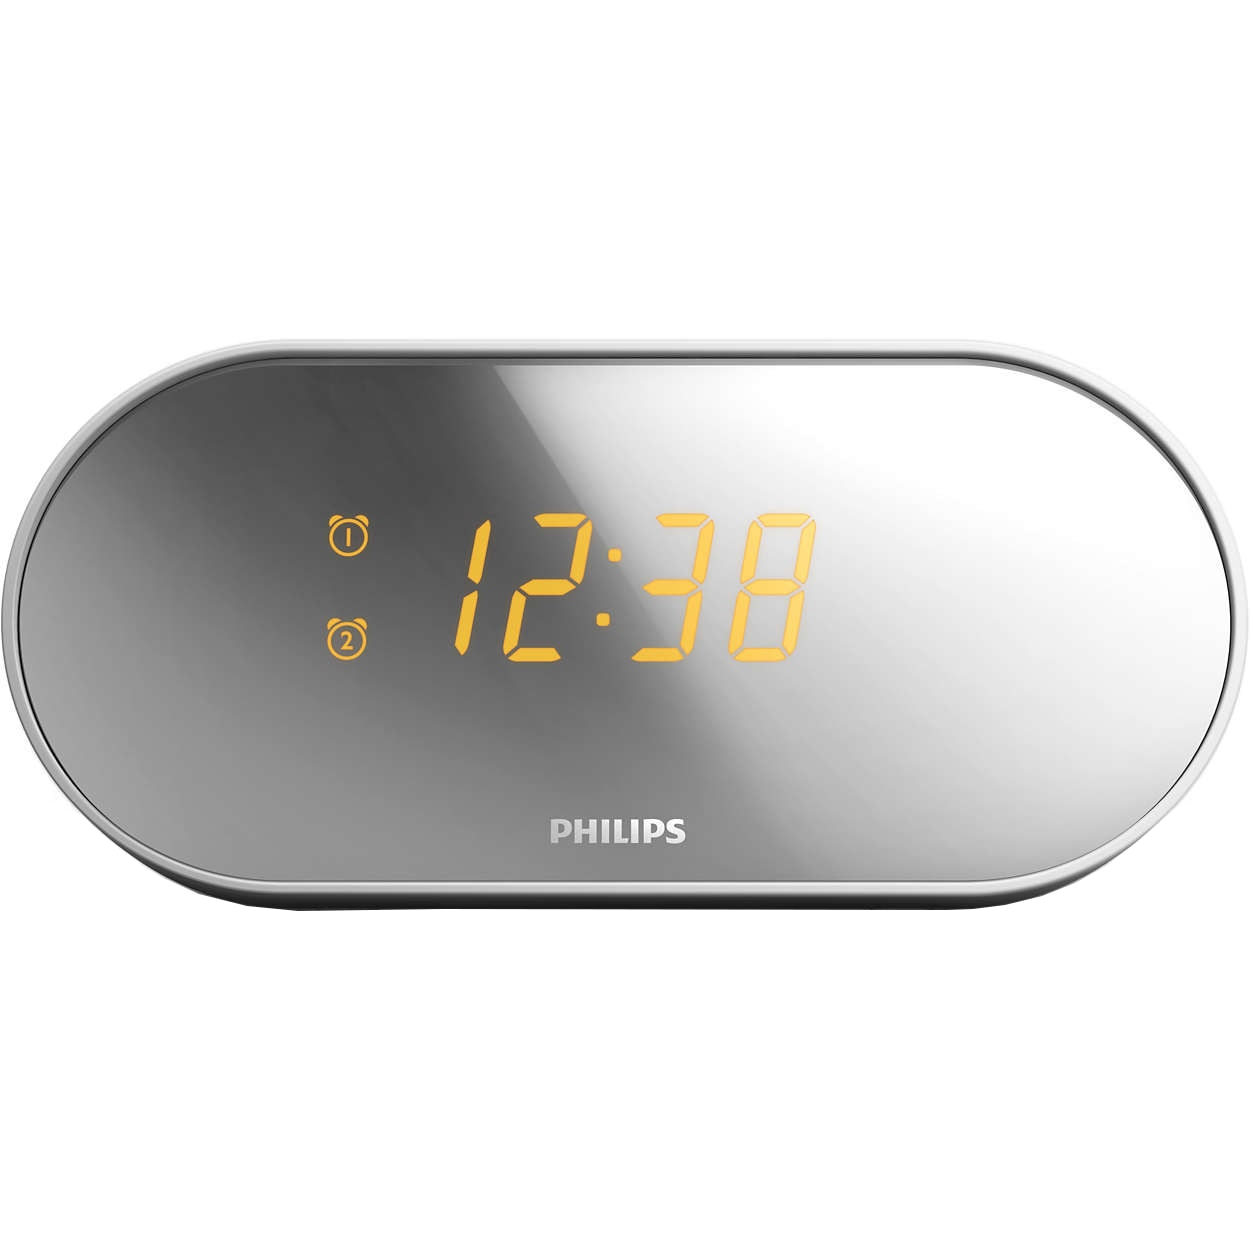 Fotografie Radio cu ceas Philips AJ200/12, FM, Digital, Alarma dubla